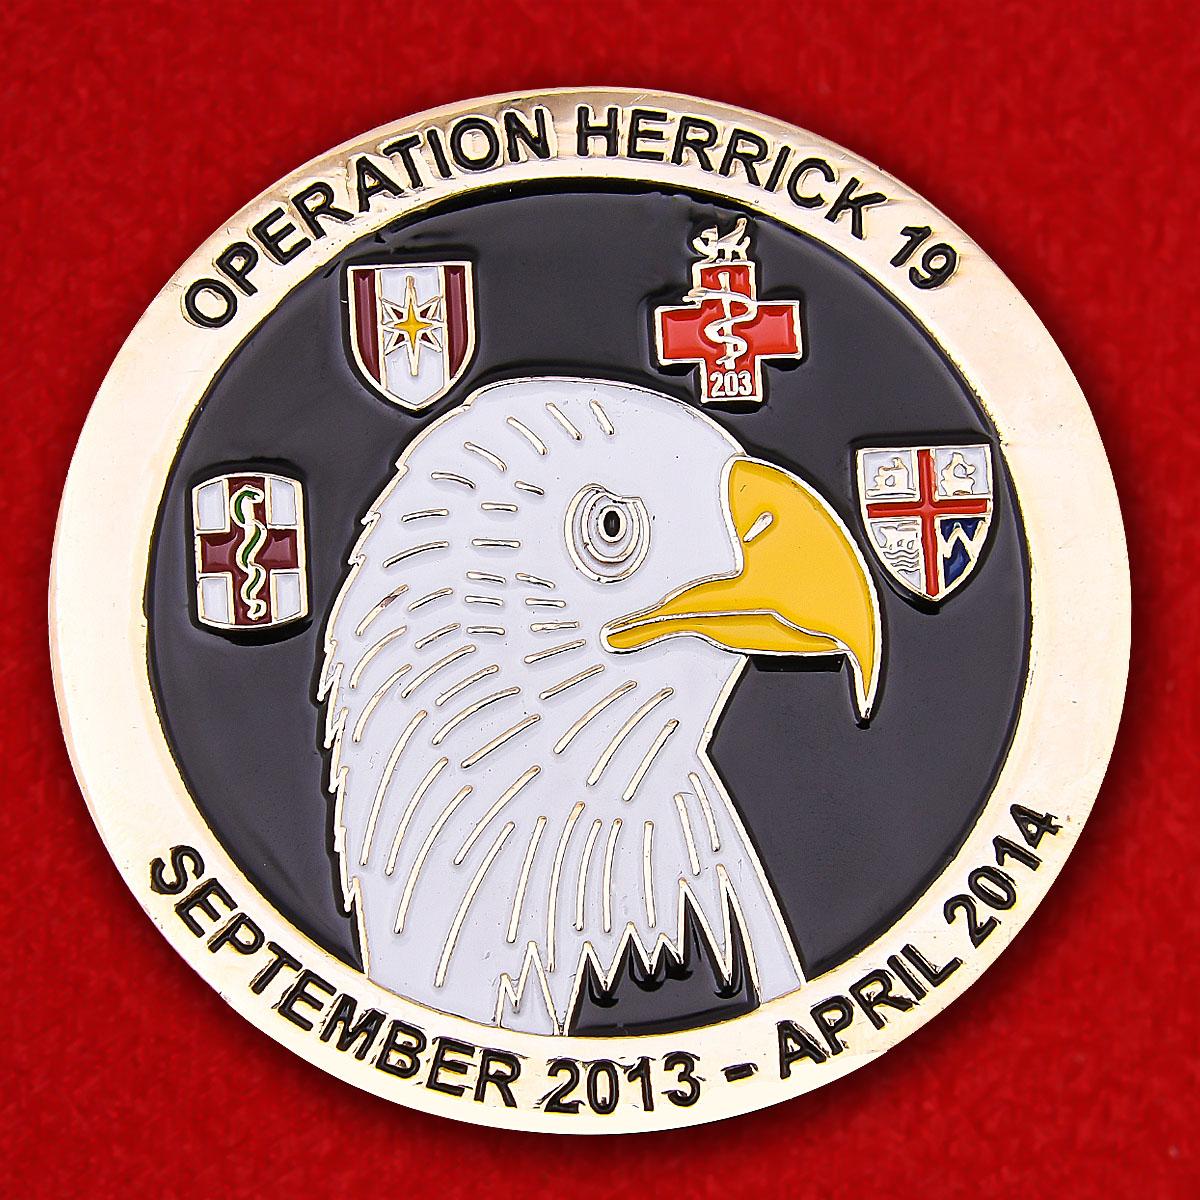 NATO Bastion Hospital Helmand, Afghanistan Operation Herrick 19 Challenge Coin